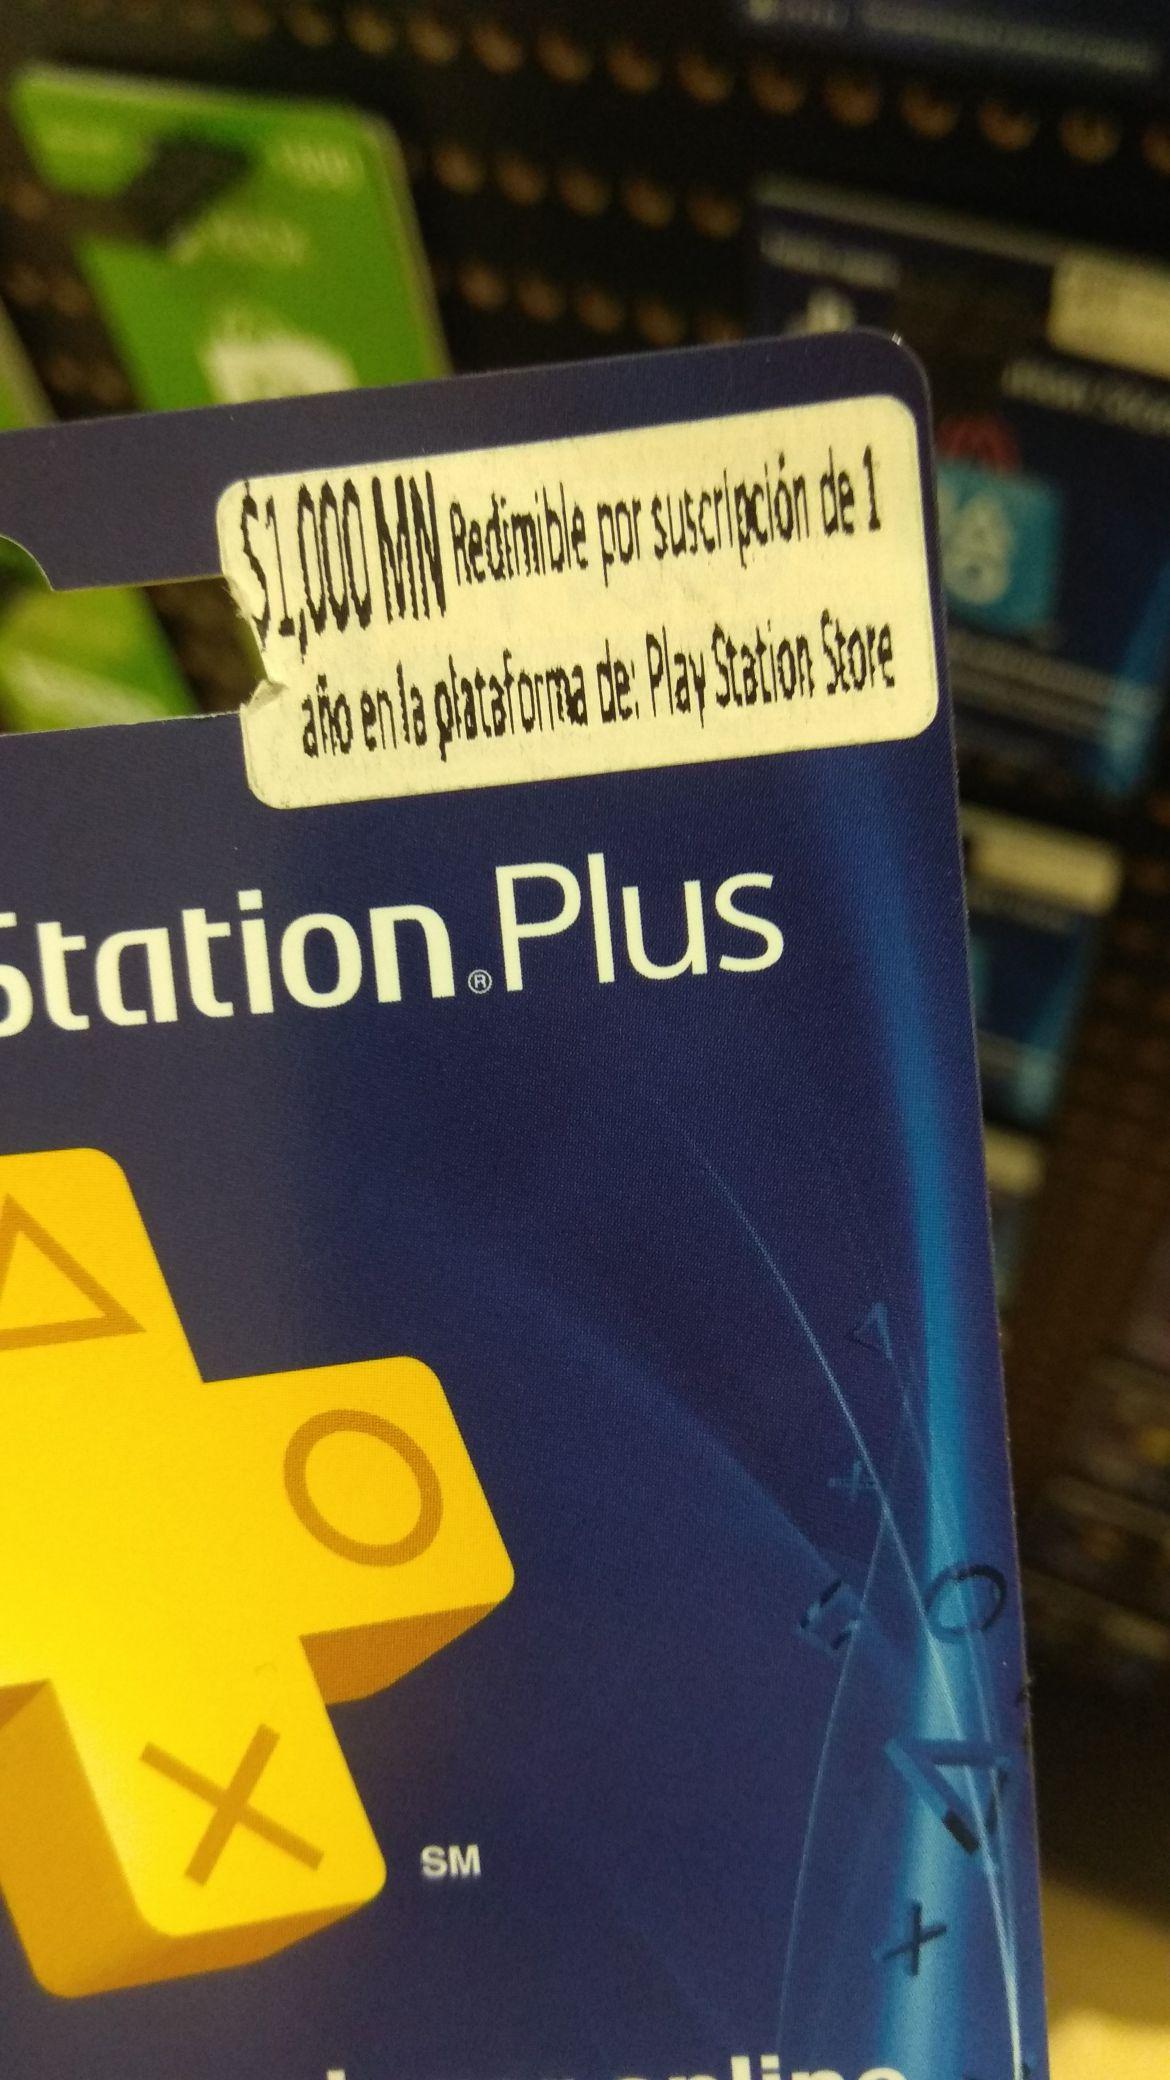 Soriana - tarjeta PS Plus 1 año a $1000